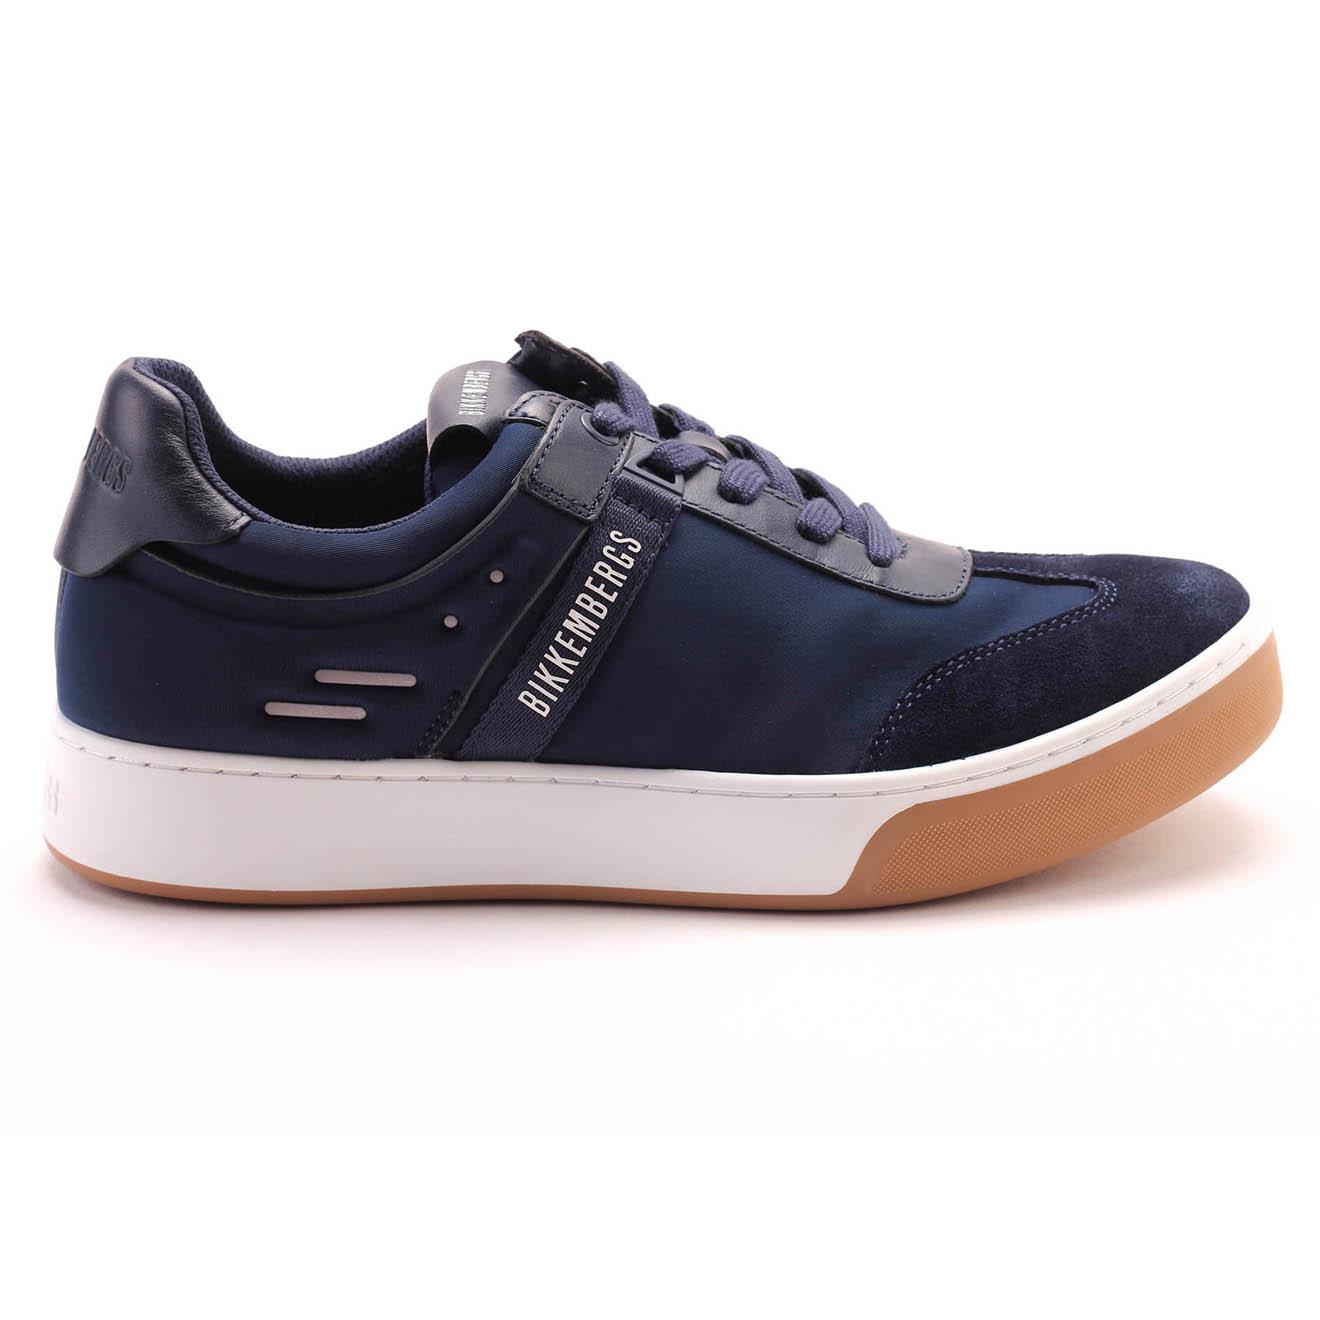 Sneakers Balduin bleu marine - Bikkembergs - Modalova